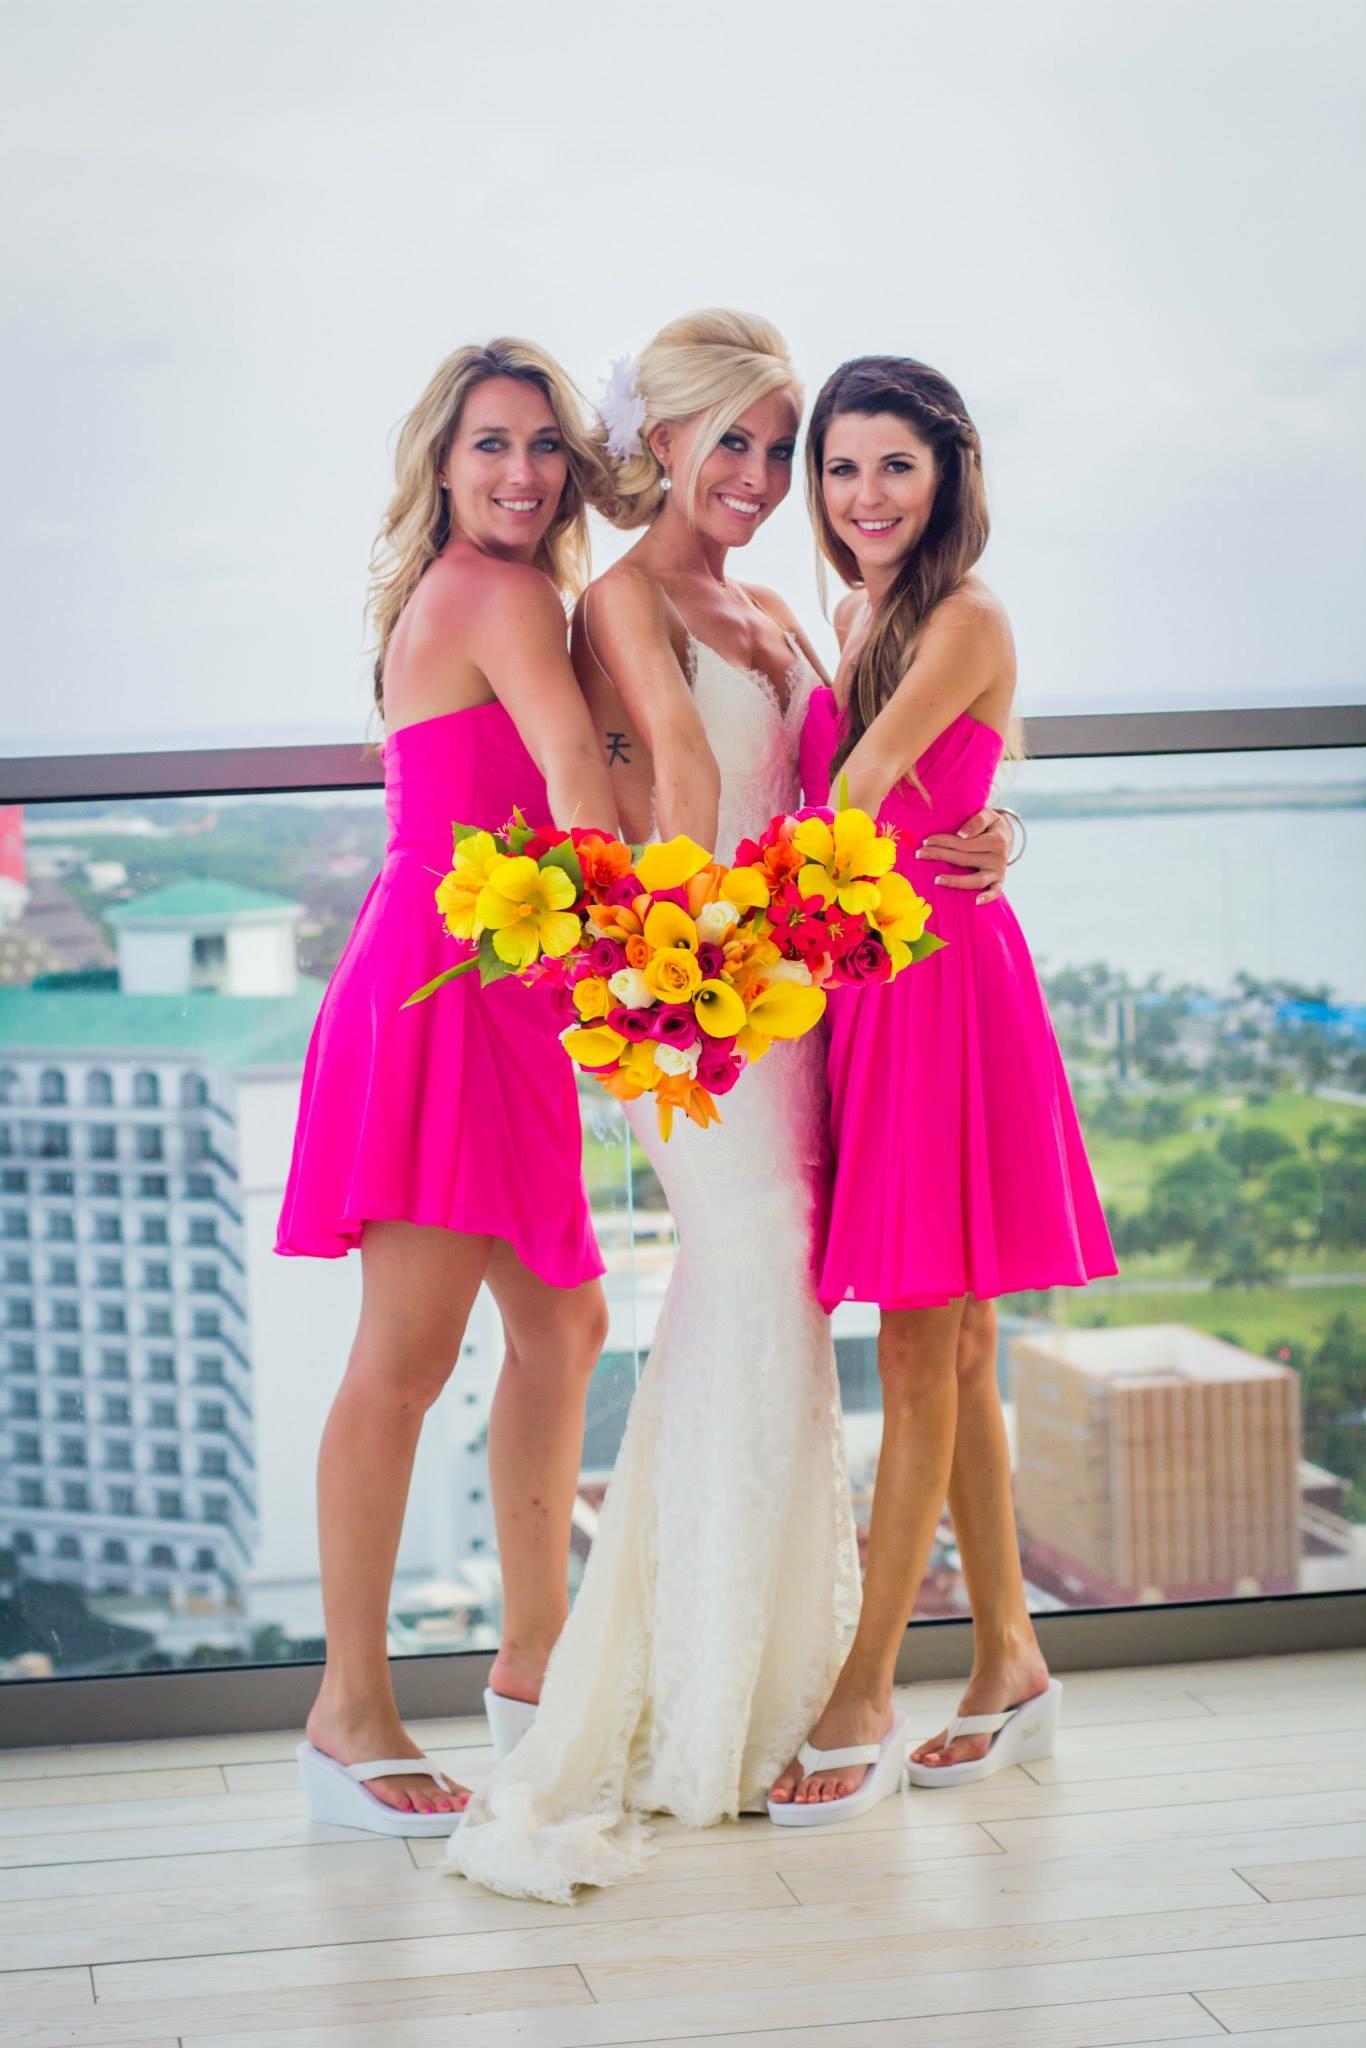 krysten-reed-cancun-beach-wedding-3.JPG